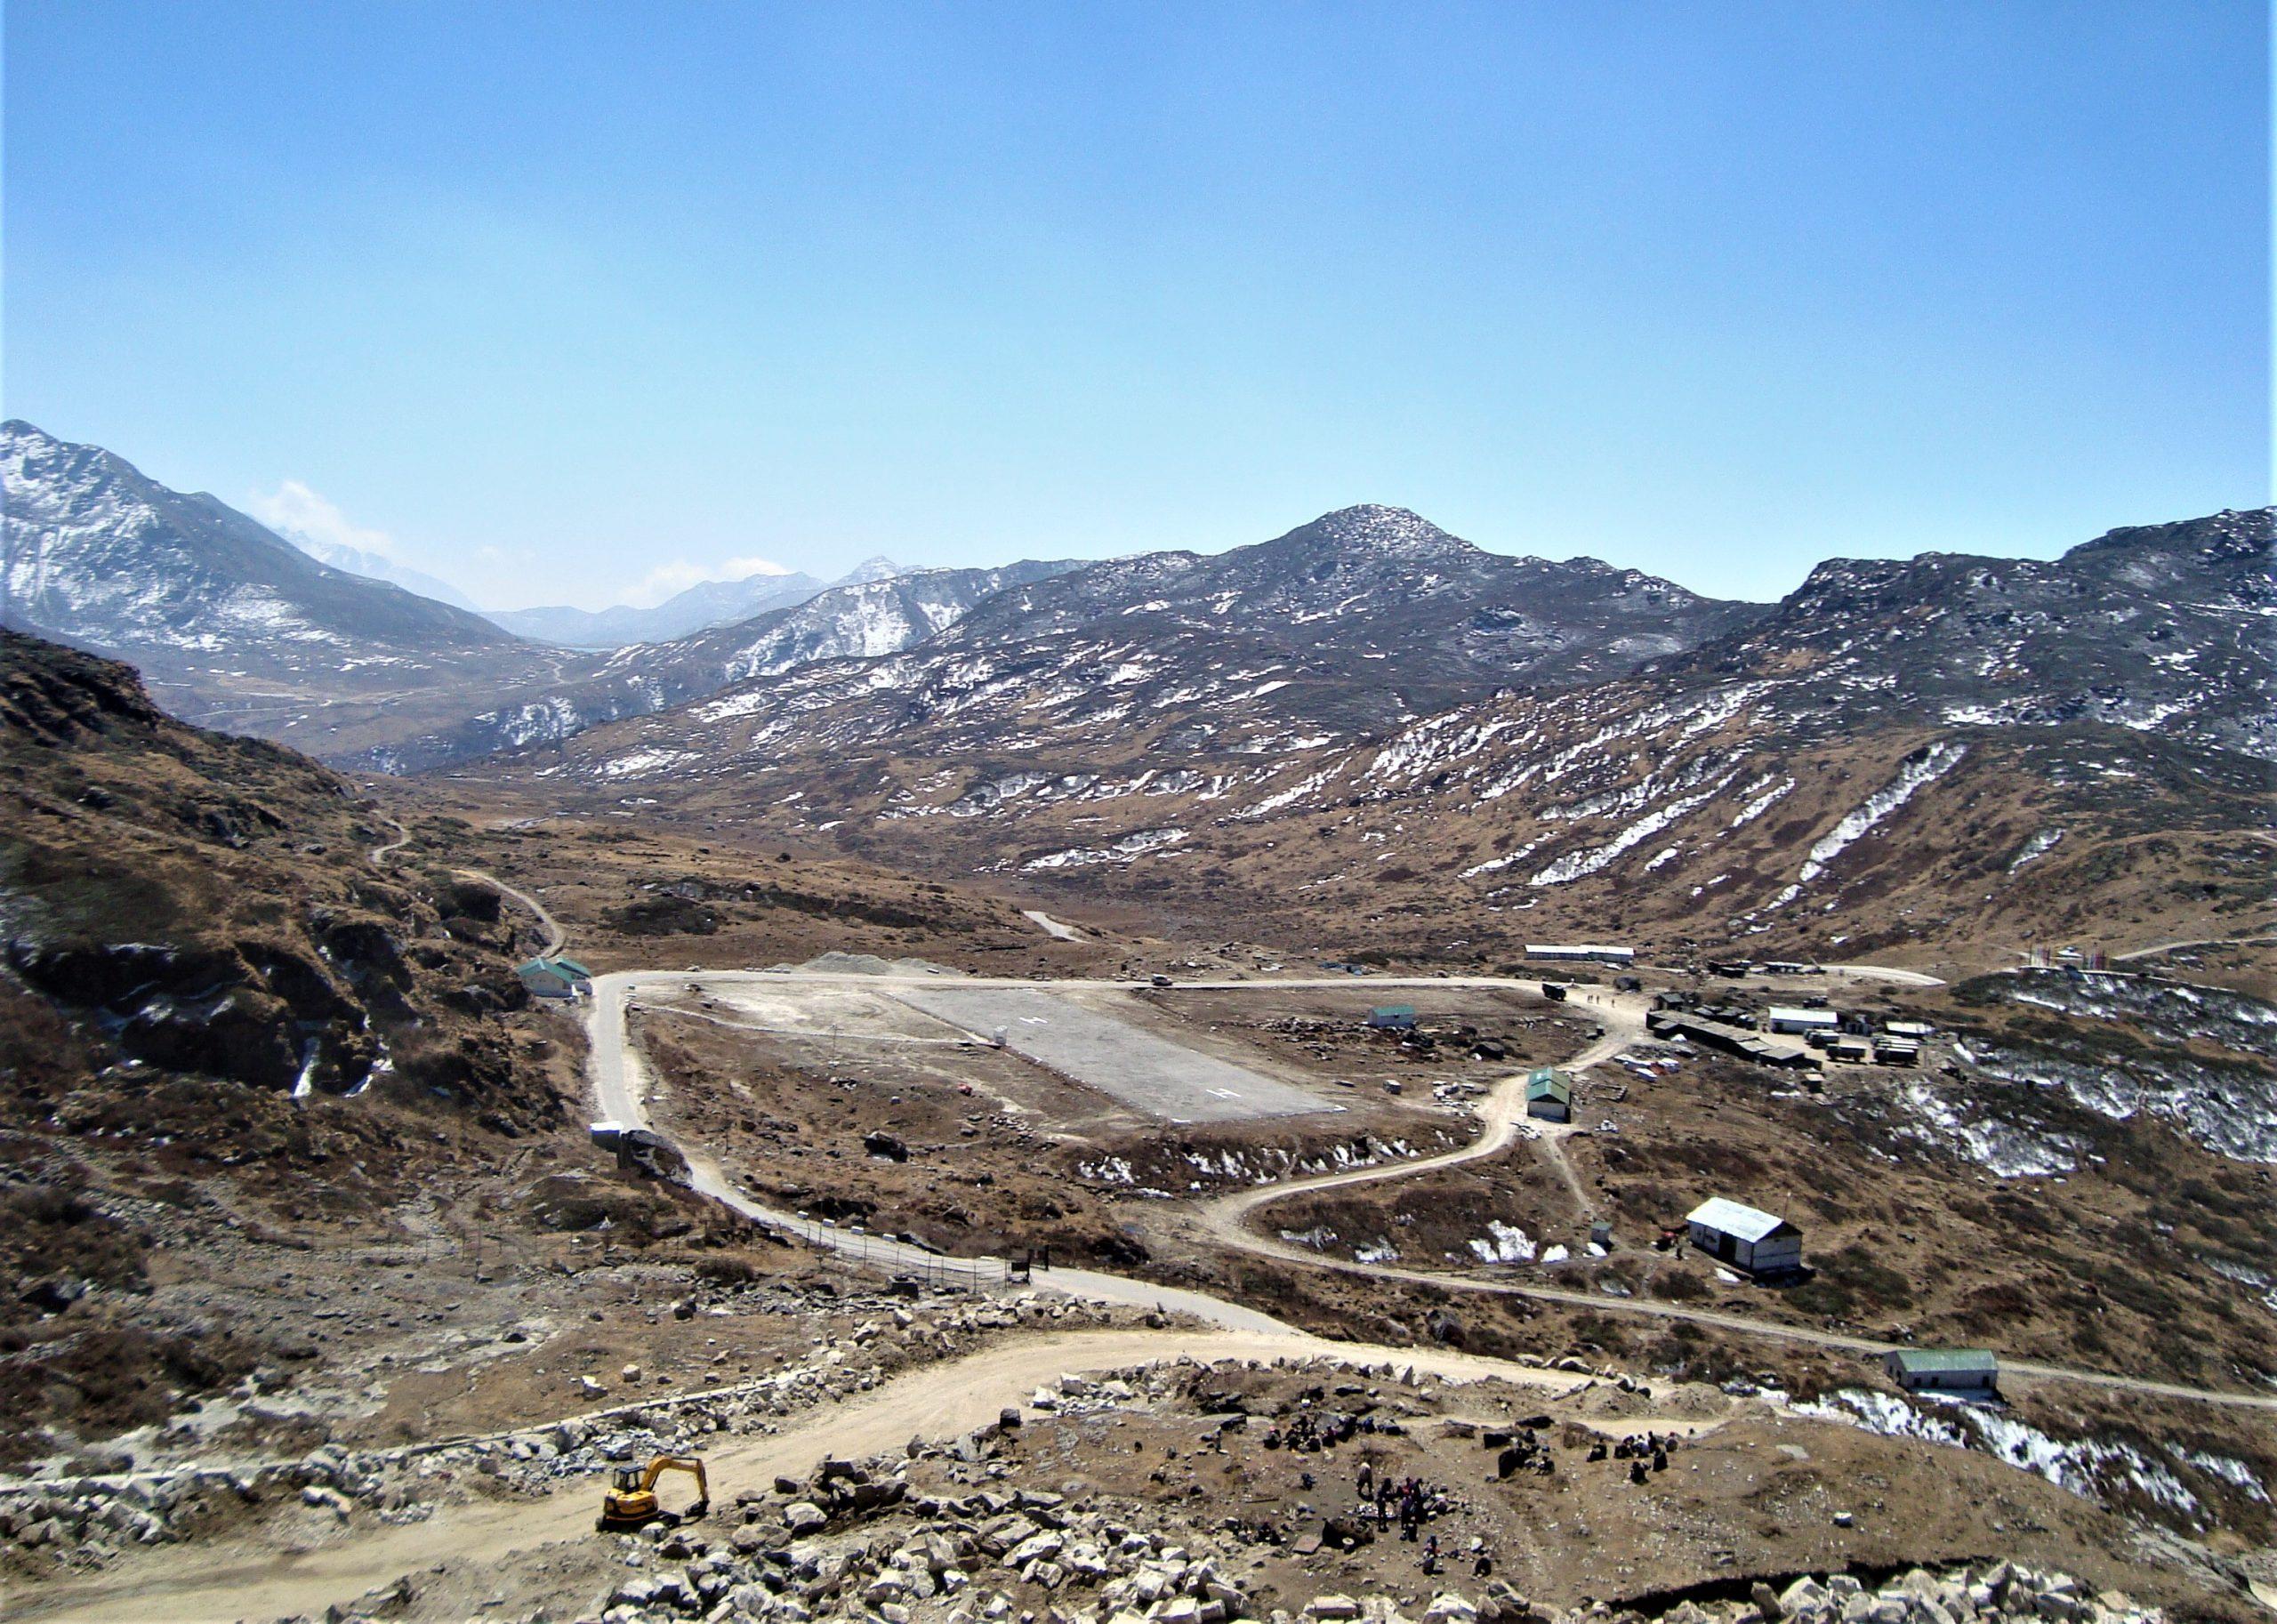 Winding road near Nathula Pass in Sikkim